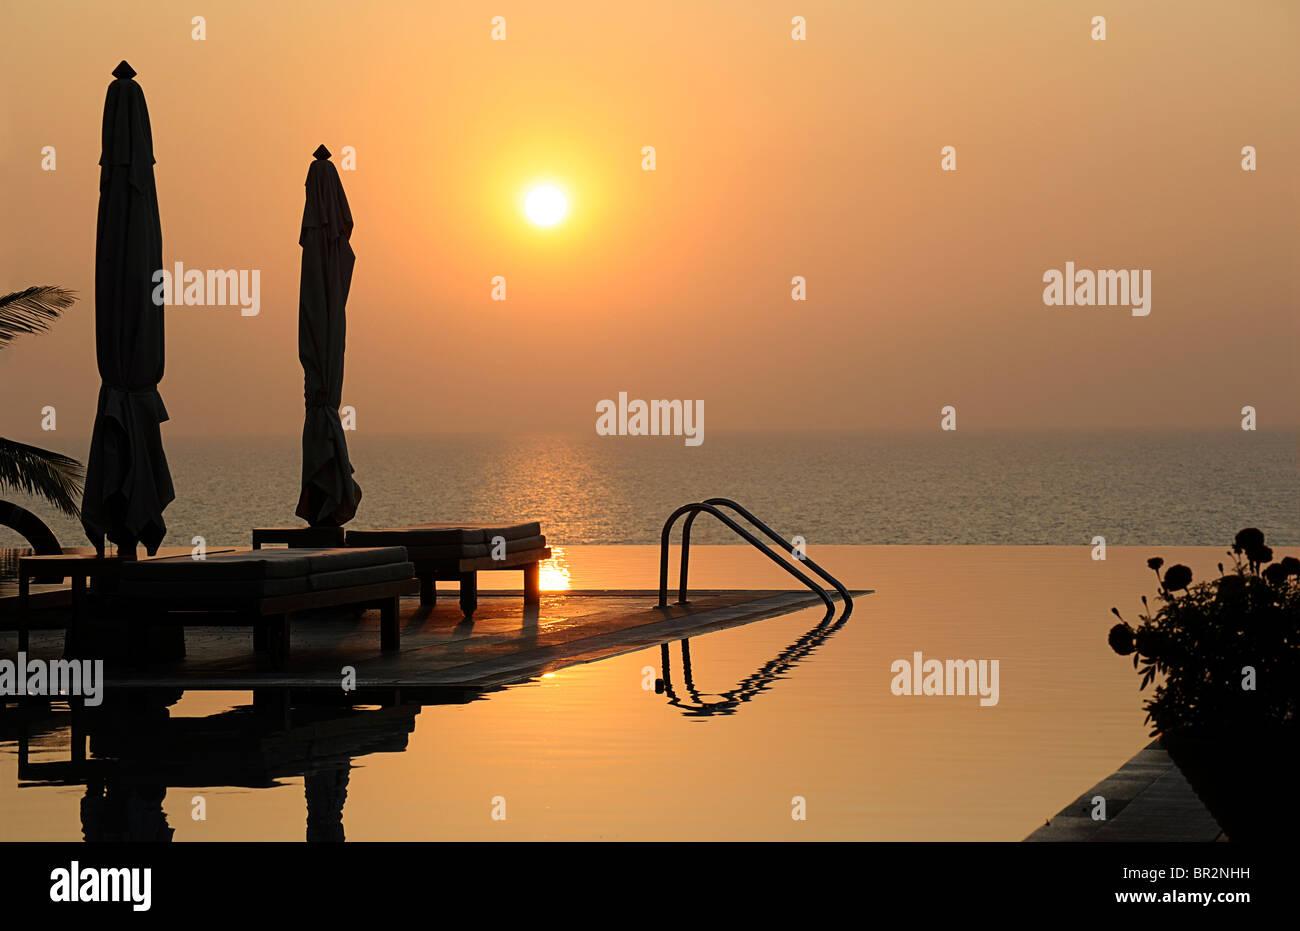 Hotel piscina infinita al atardecer, Kovalam, Kerala, India Imagen De Stock